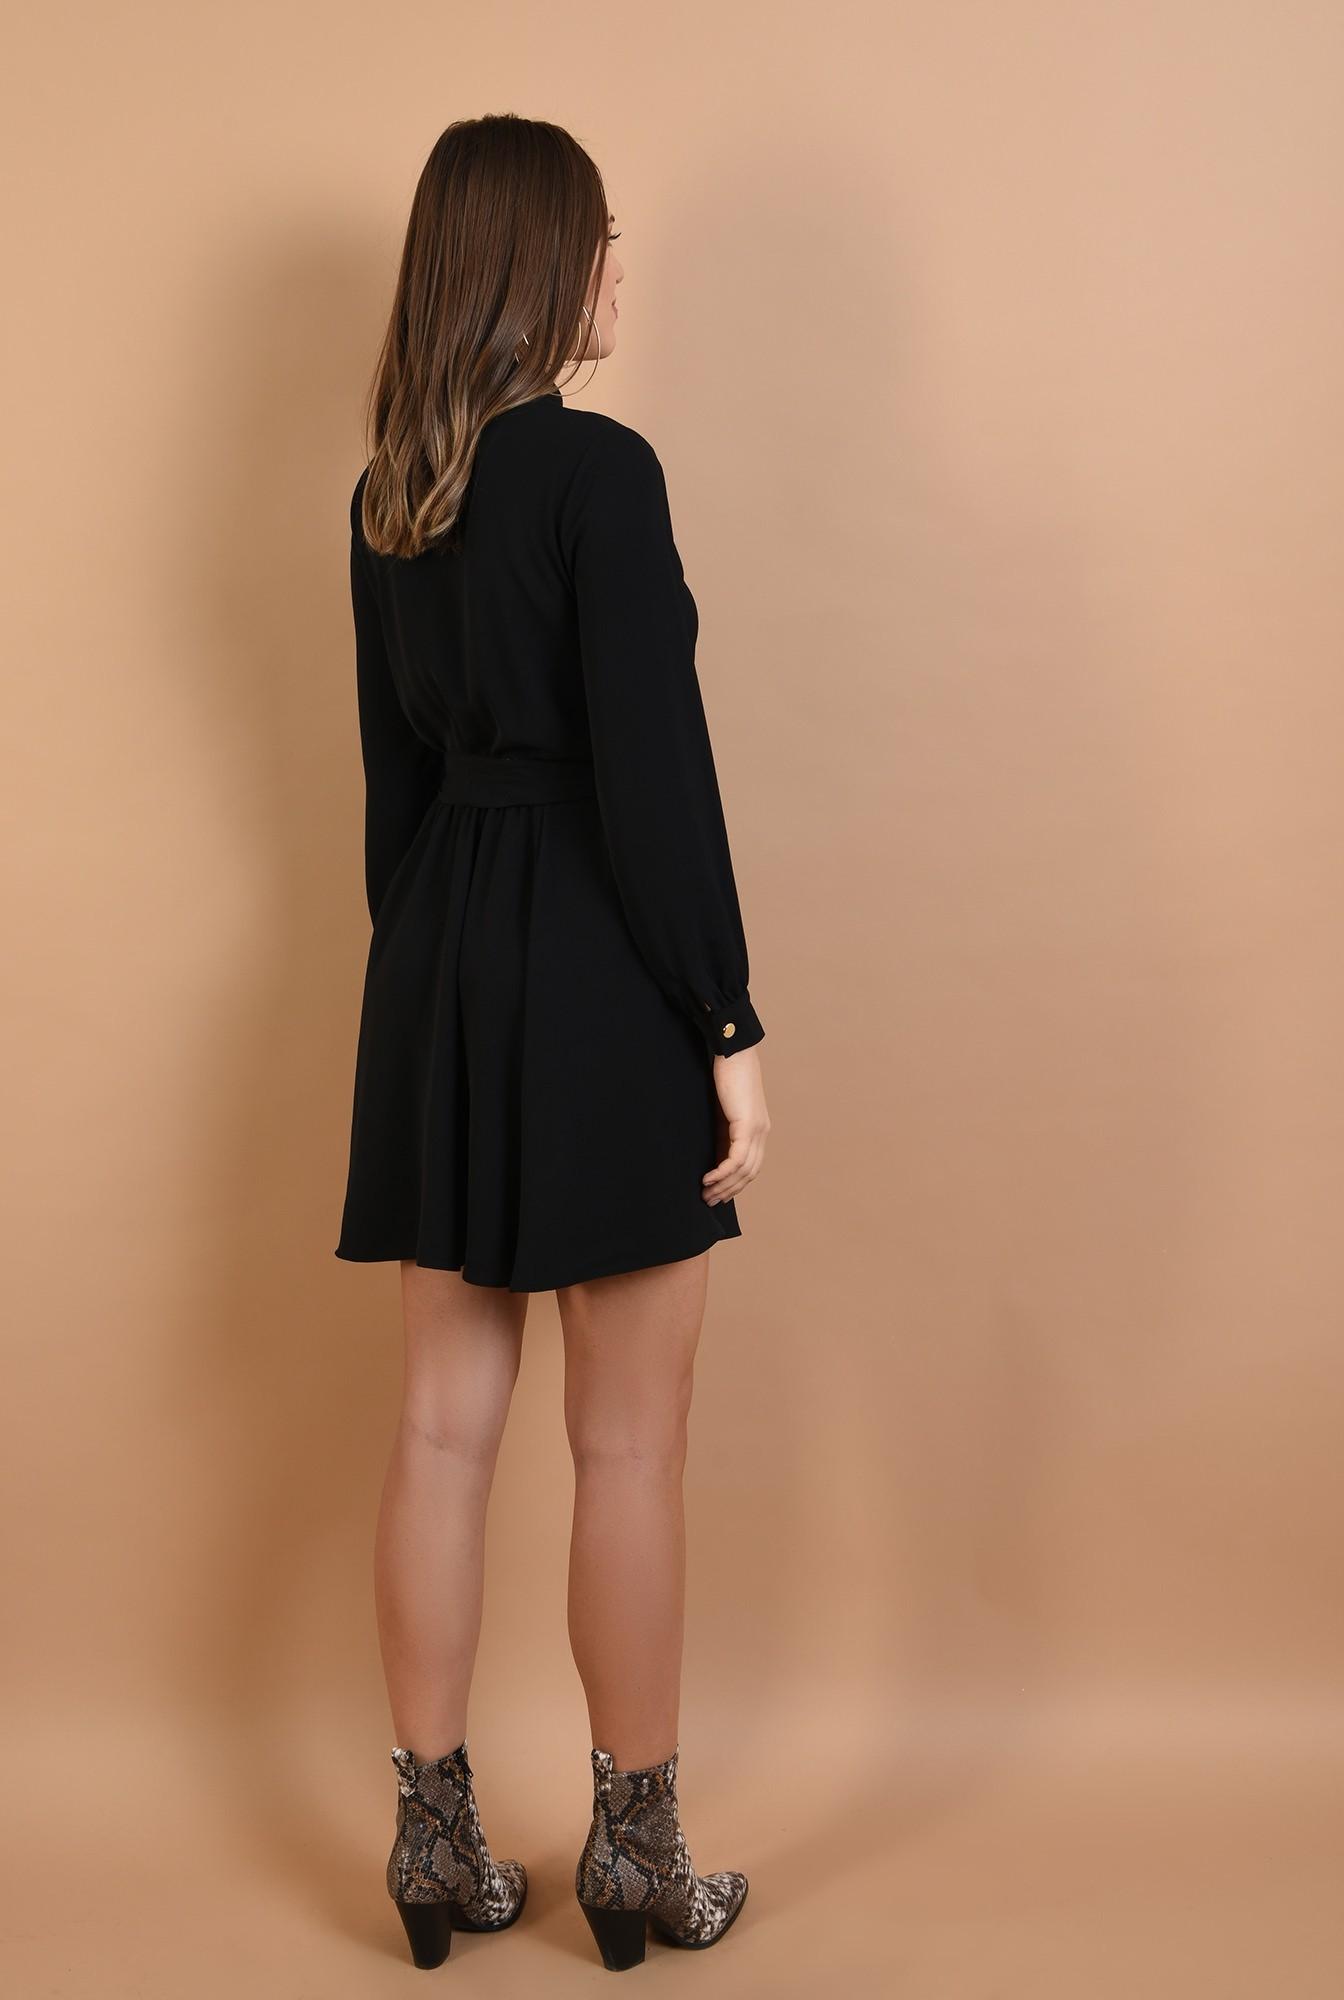 1 - rochie neagra, scurta, cu nasturi, cordon, Poema